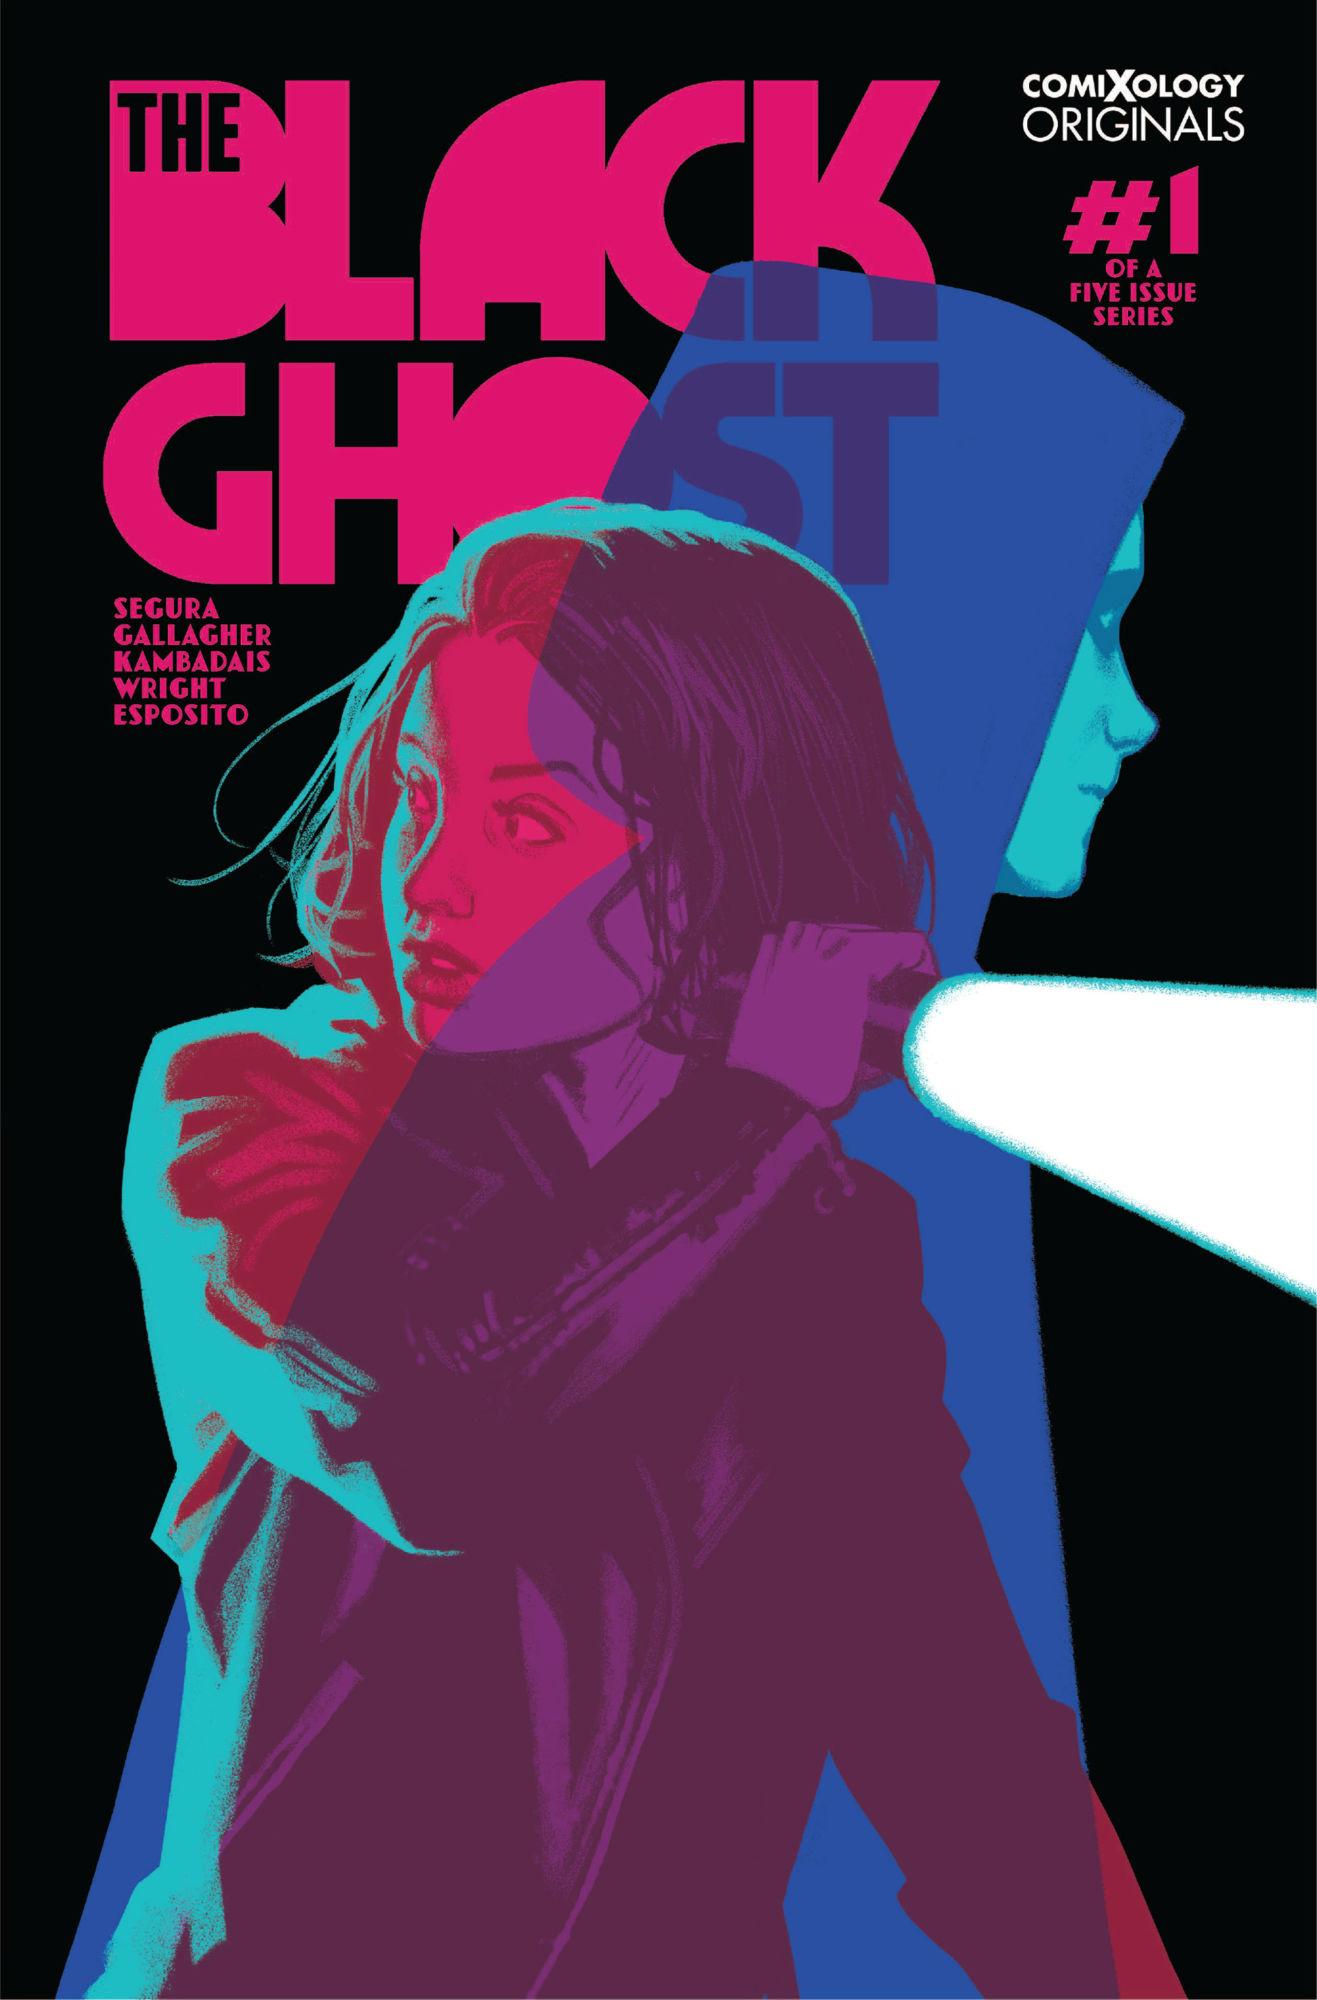 Vigilante Socialism and Investigative Journalism in ComiXology Original Black Ghost #1 [Preview]